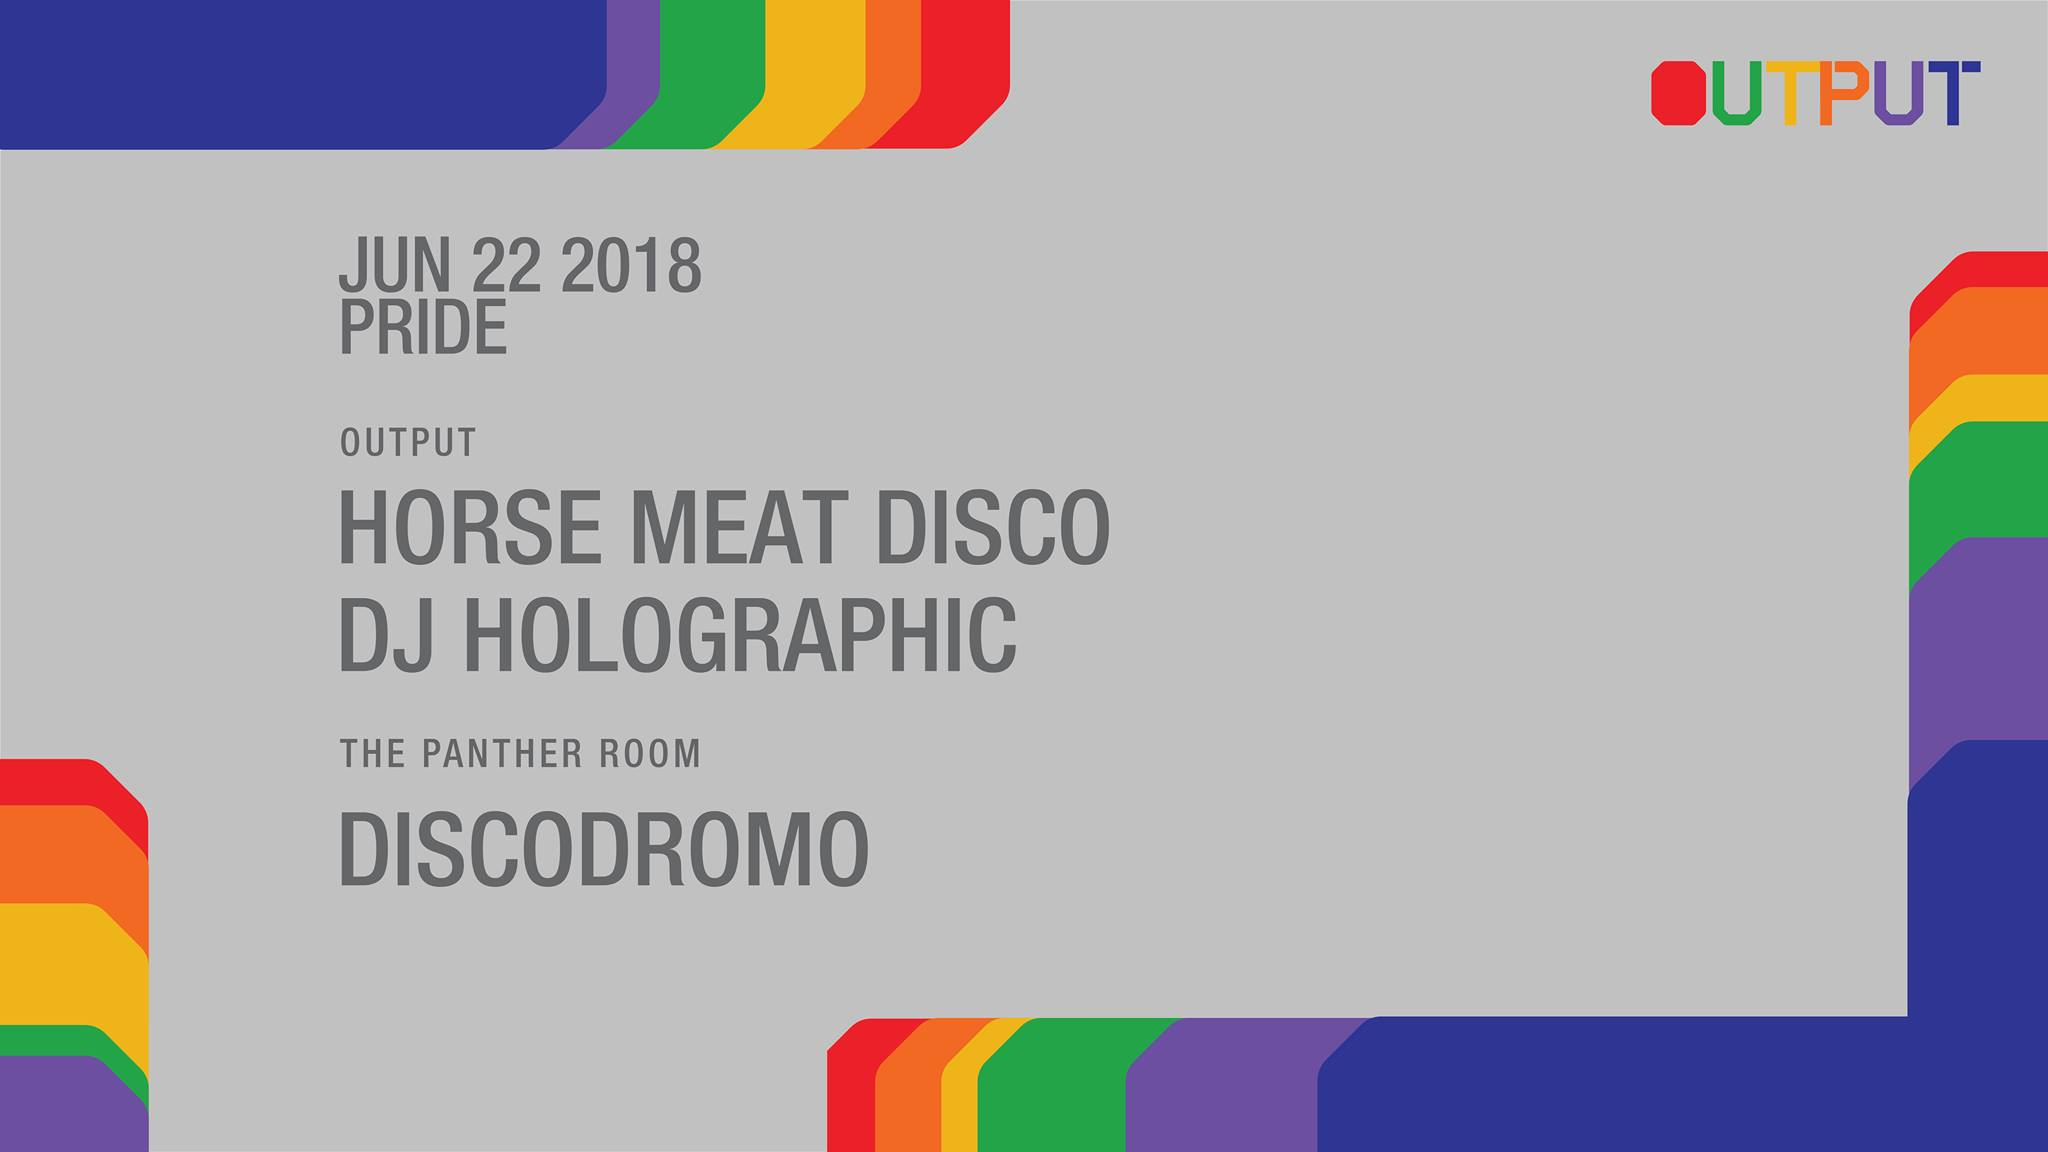 Output Club BK Robbie Lumpkin Promotions horse meat disco